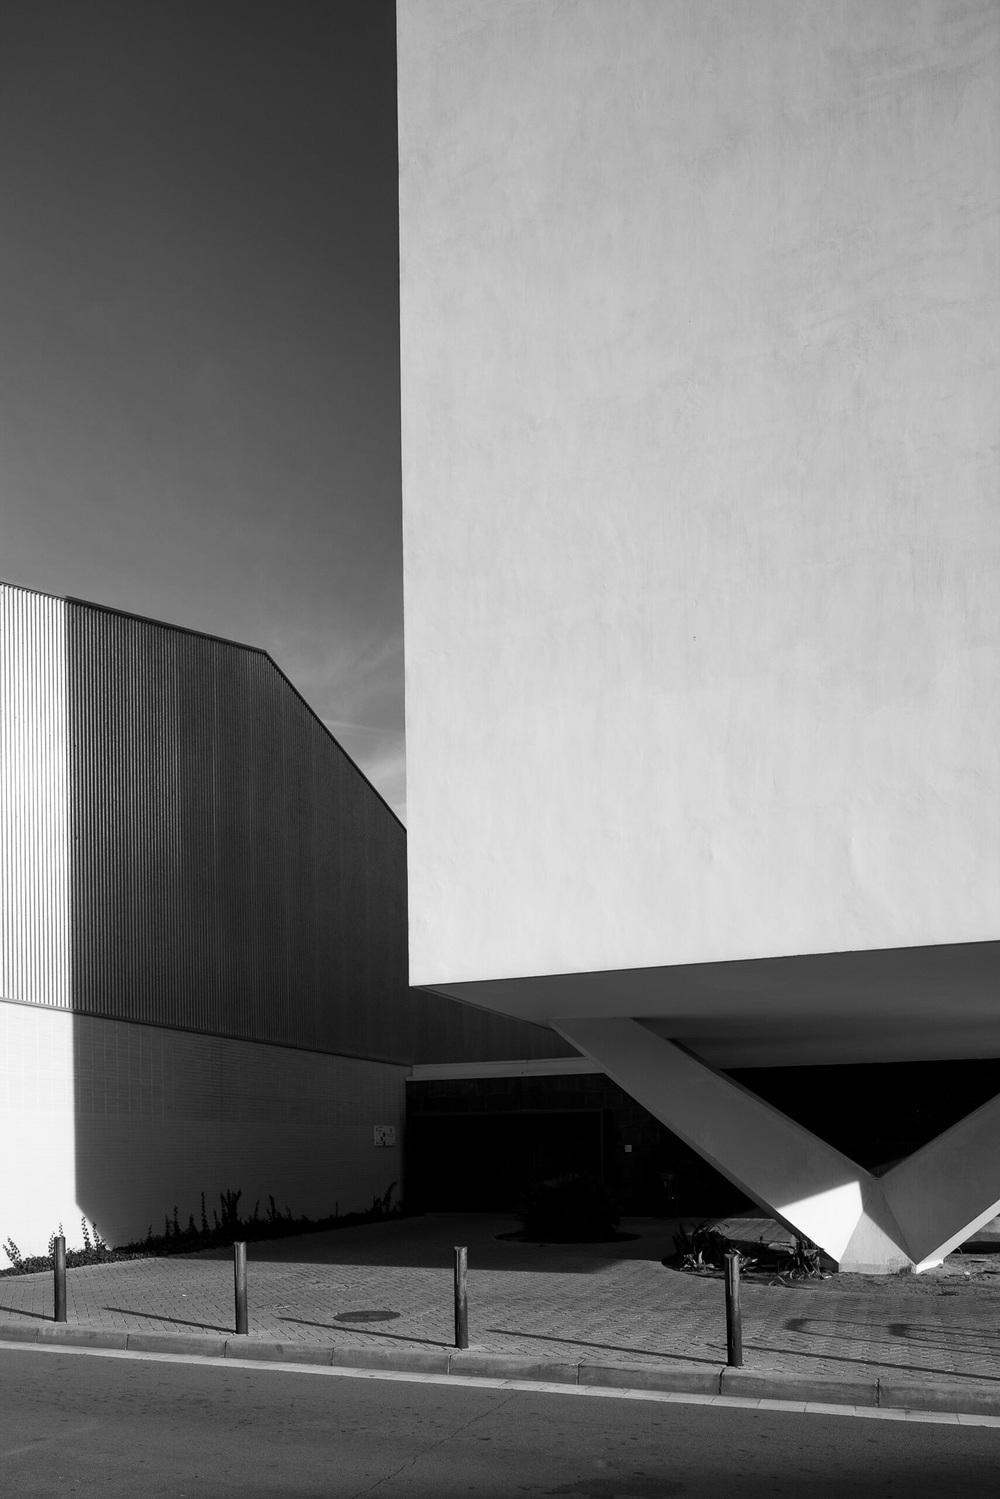 CAP Progrès-Raval, Badalona (BAAS Arquitectura)